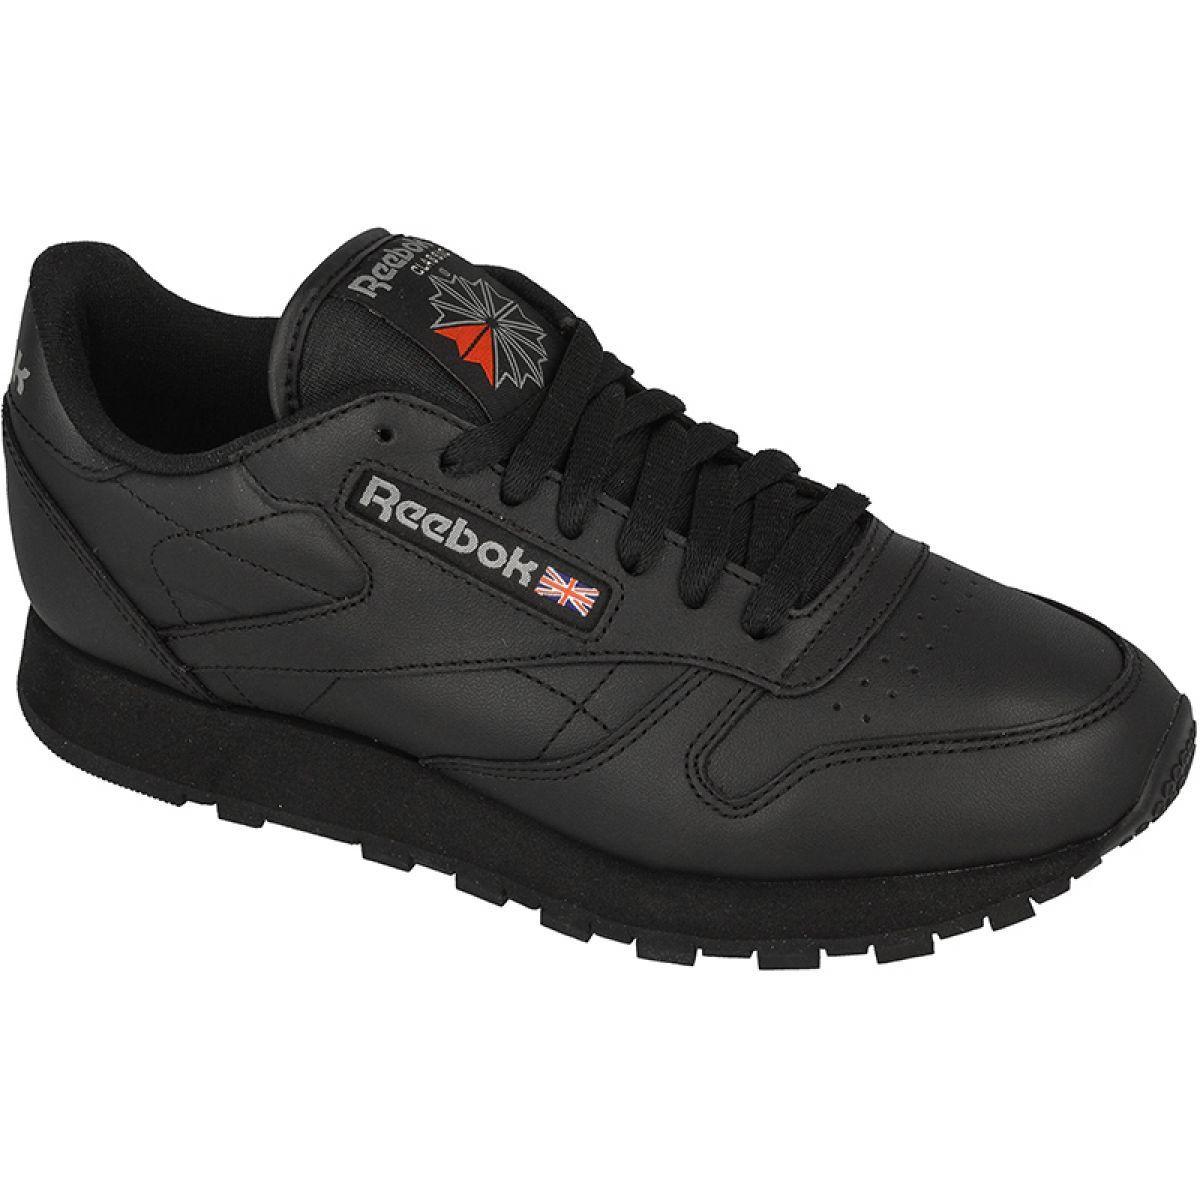 Reebok Classic Leather M 2267 Shoes Black Reebok Classic Leather Black Reebok Black Shoes Reebok Classic